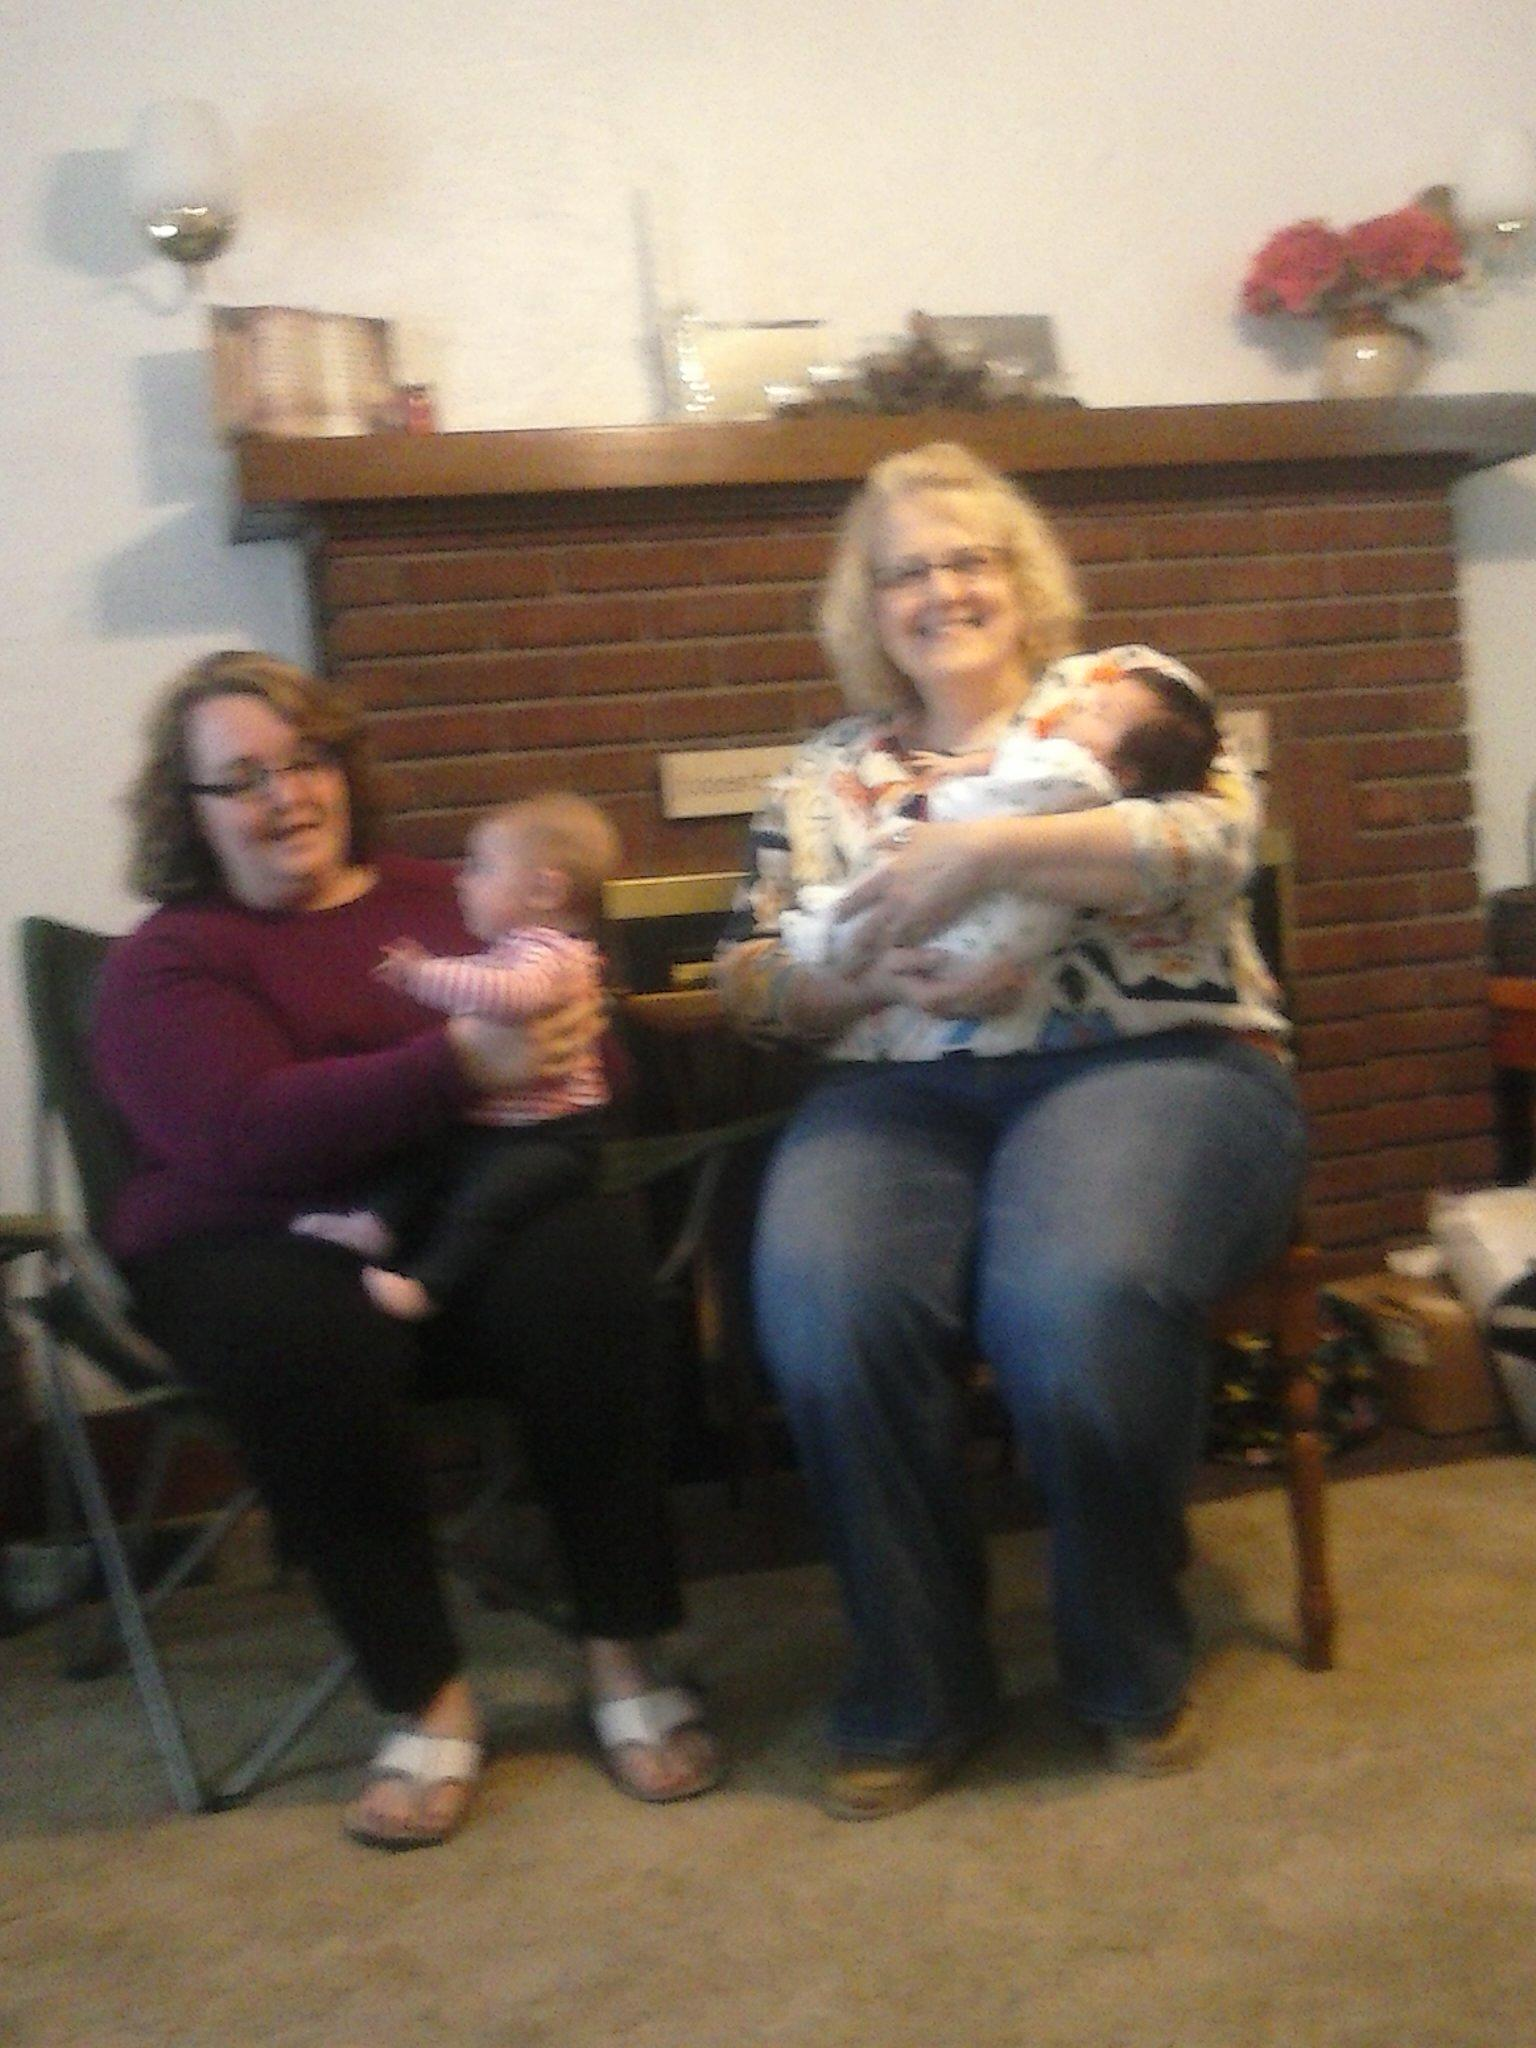 Three generations by deniseshull.hardenburg